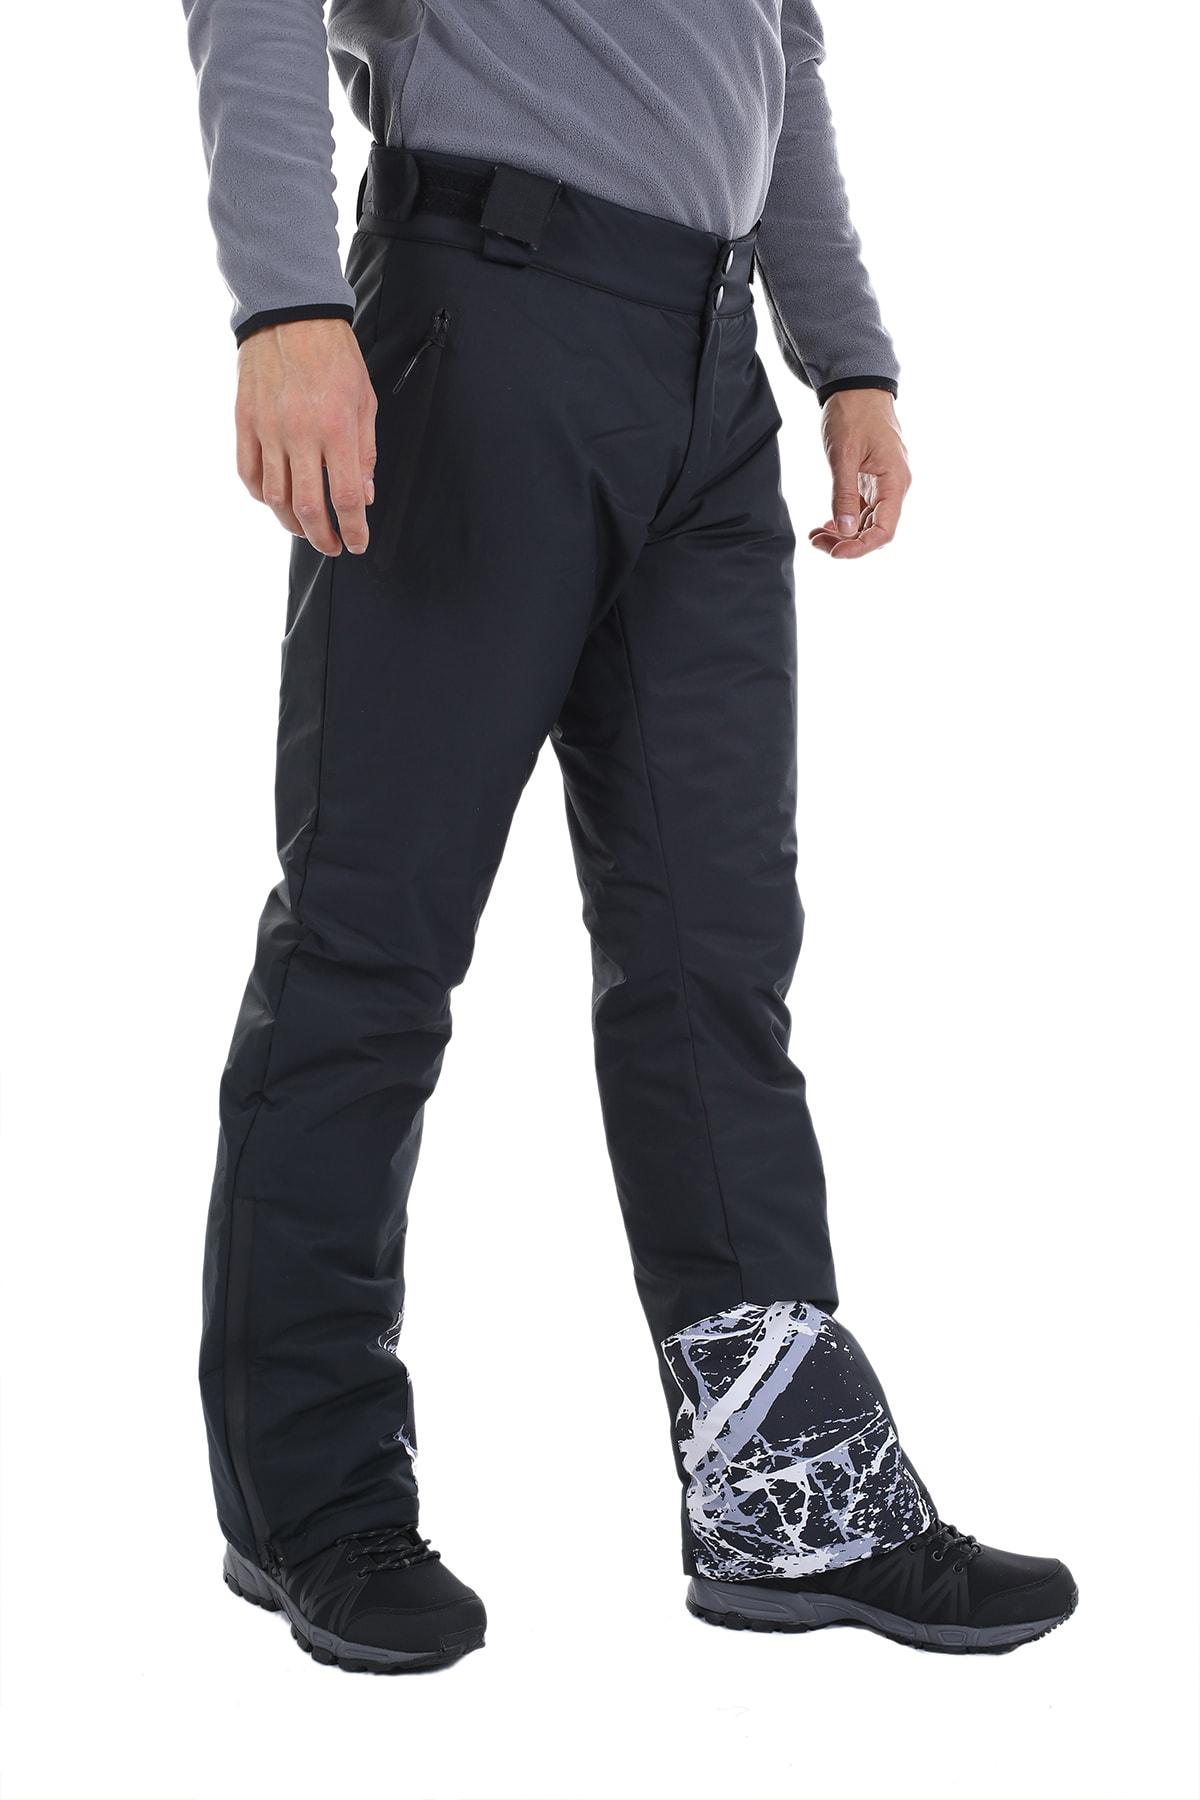 Exuma Erkek Siyah Kar Ve Kayak Pantolonu 2013131 10w342013131 2